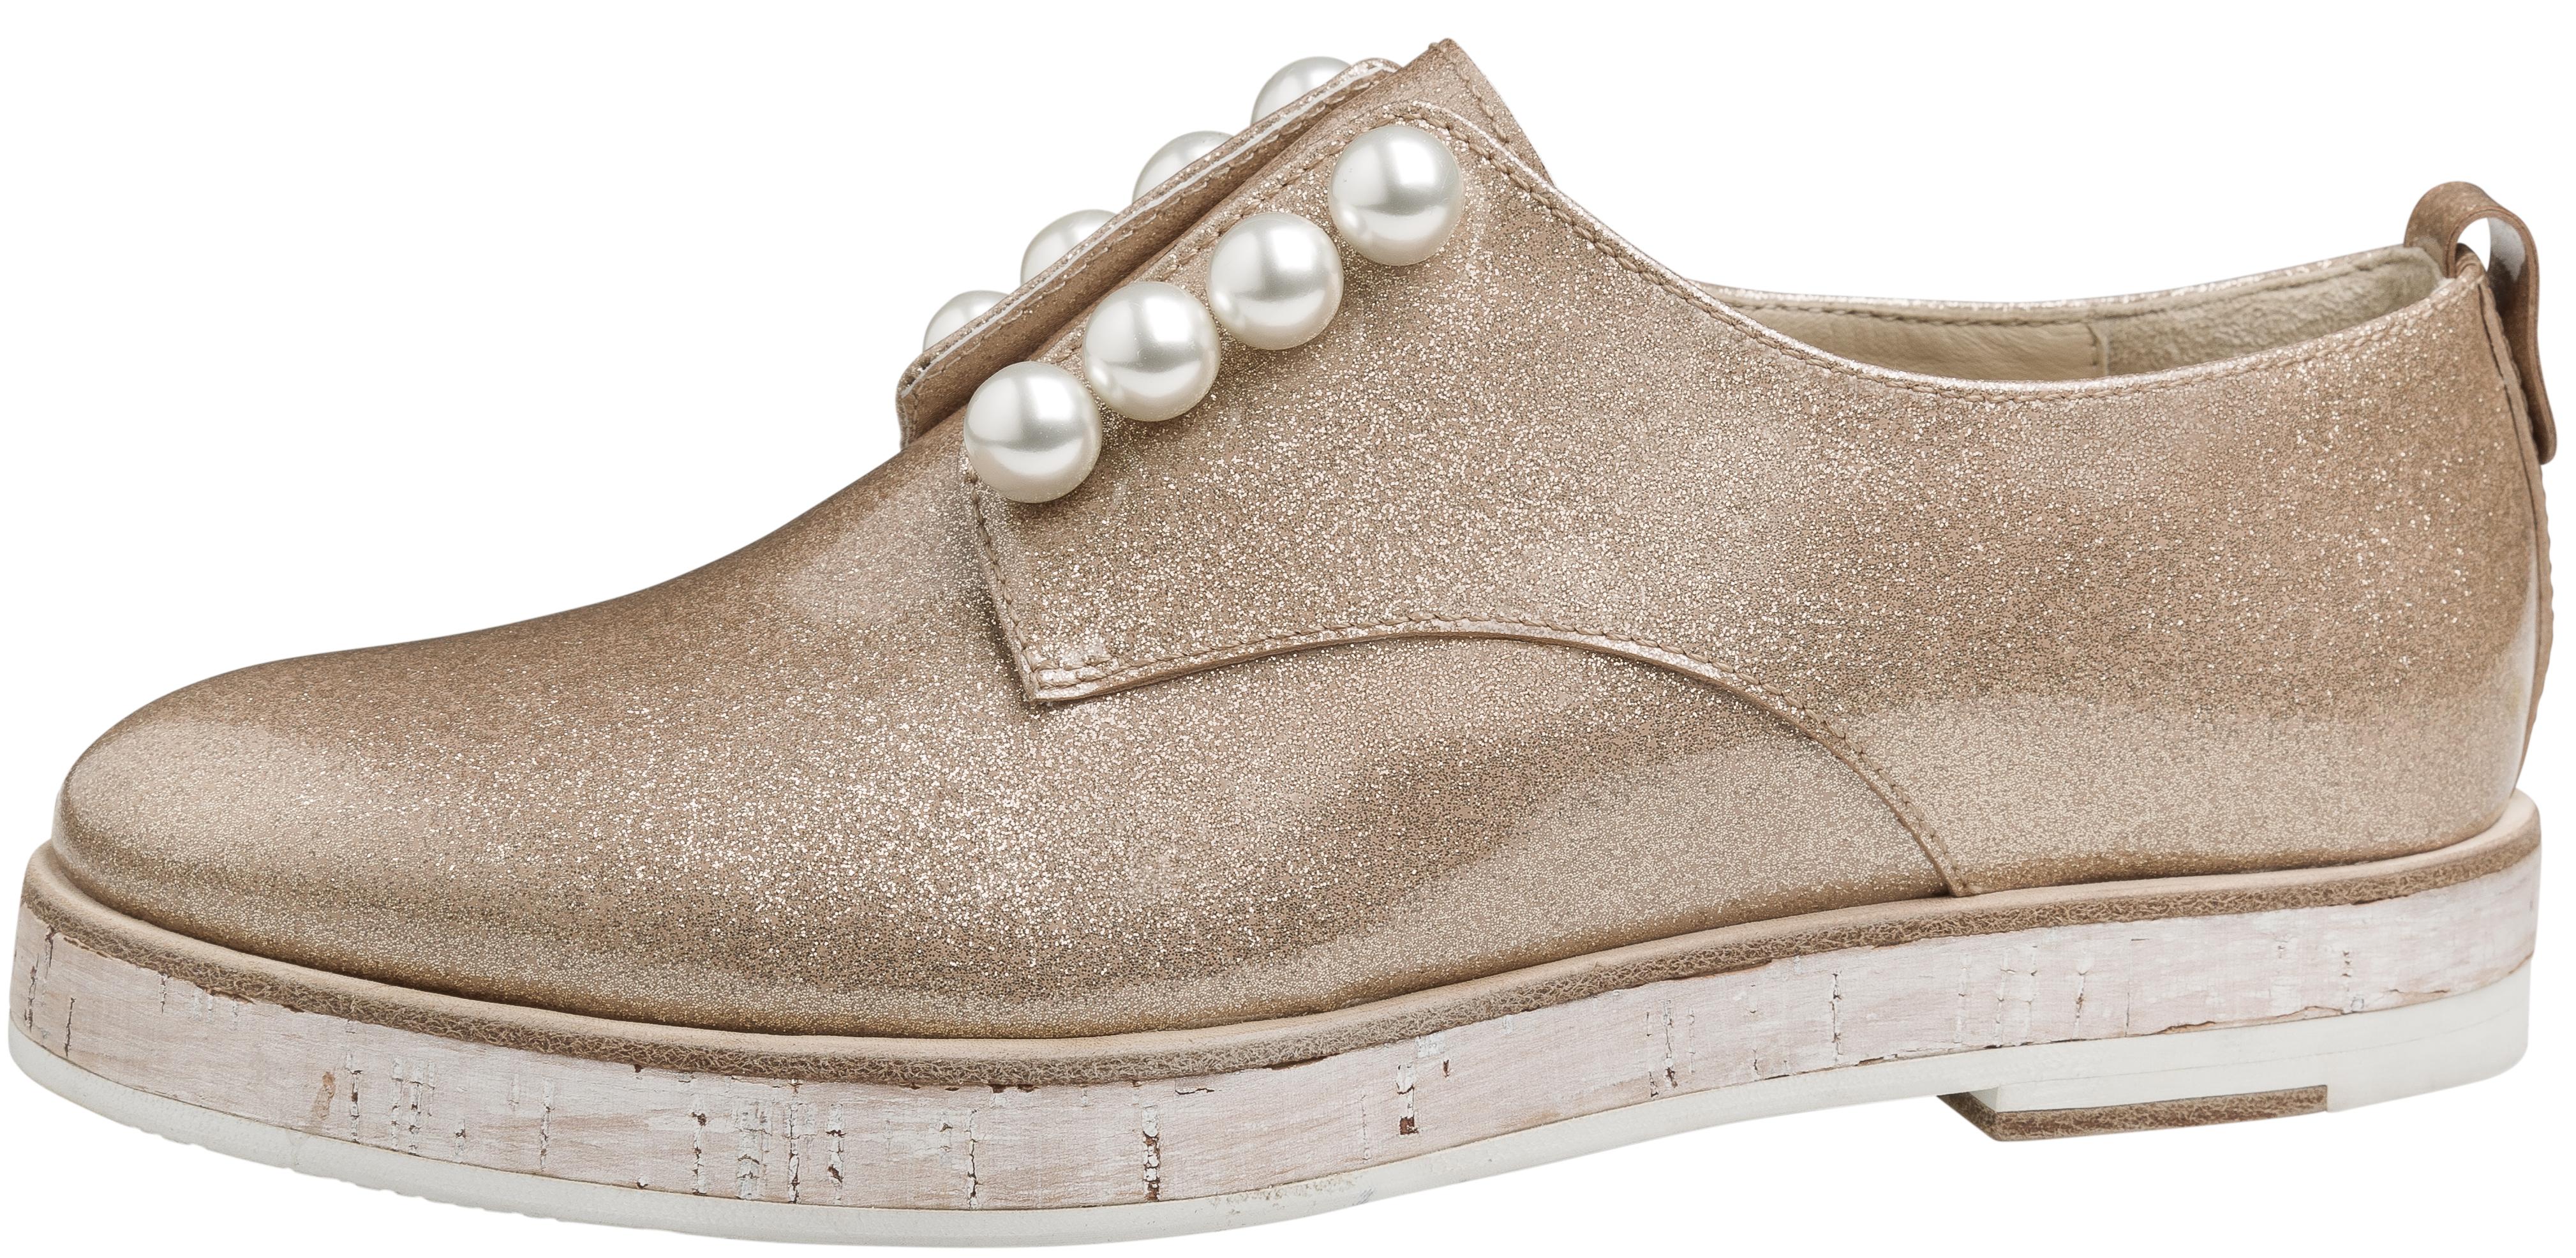 Does Anyone Buy Italian Made Shoes